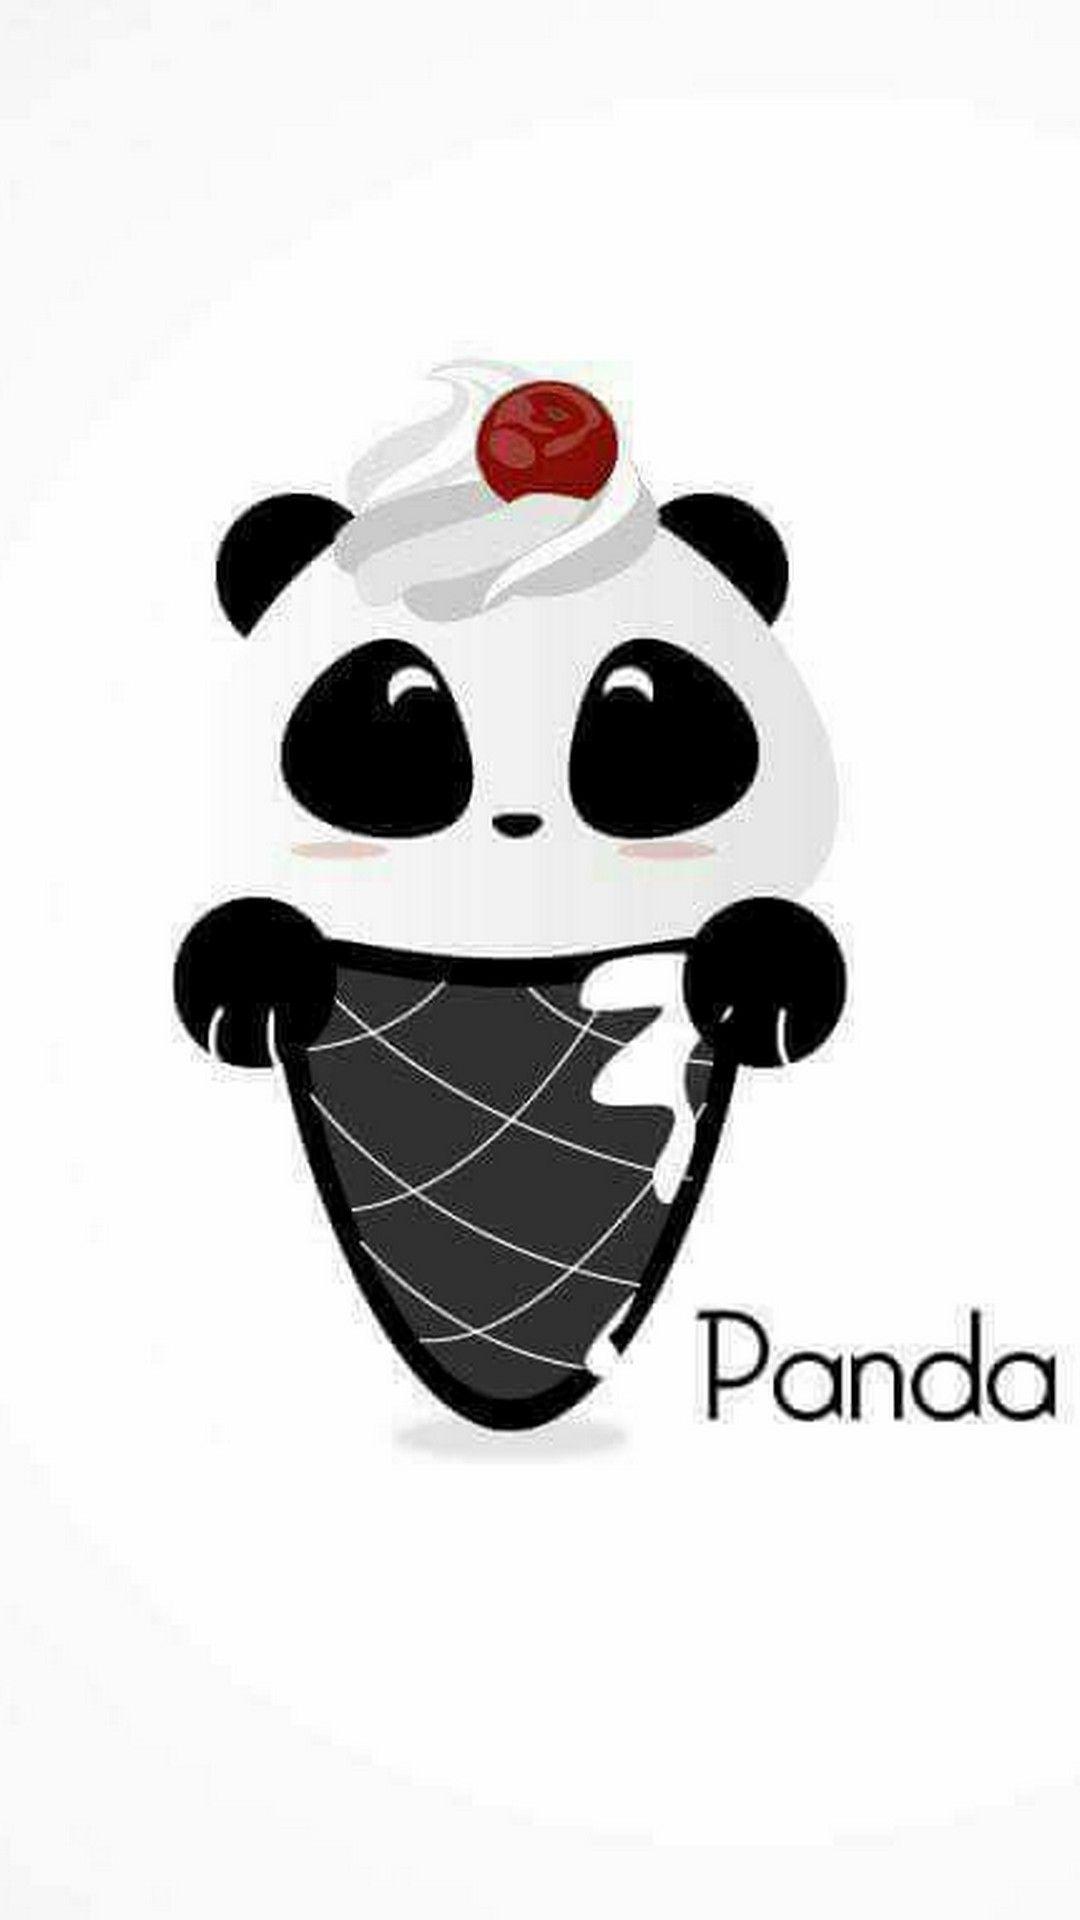 Baby Panda Phone Backgrounds Best Hd Wallpapers Cute Panda Wallpaper Hd Cute Wallpapers Panda Wallpapers